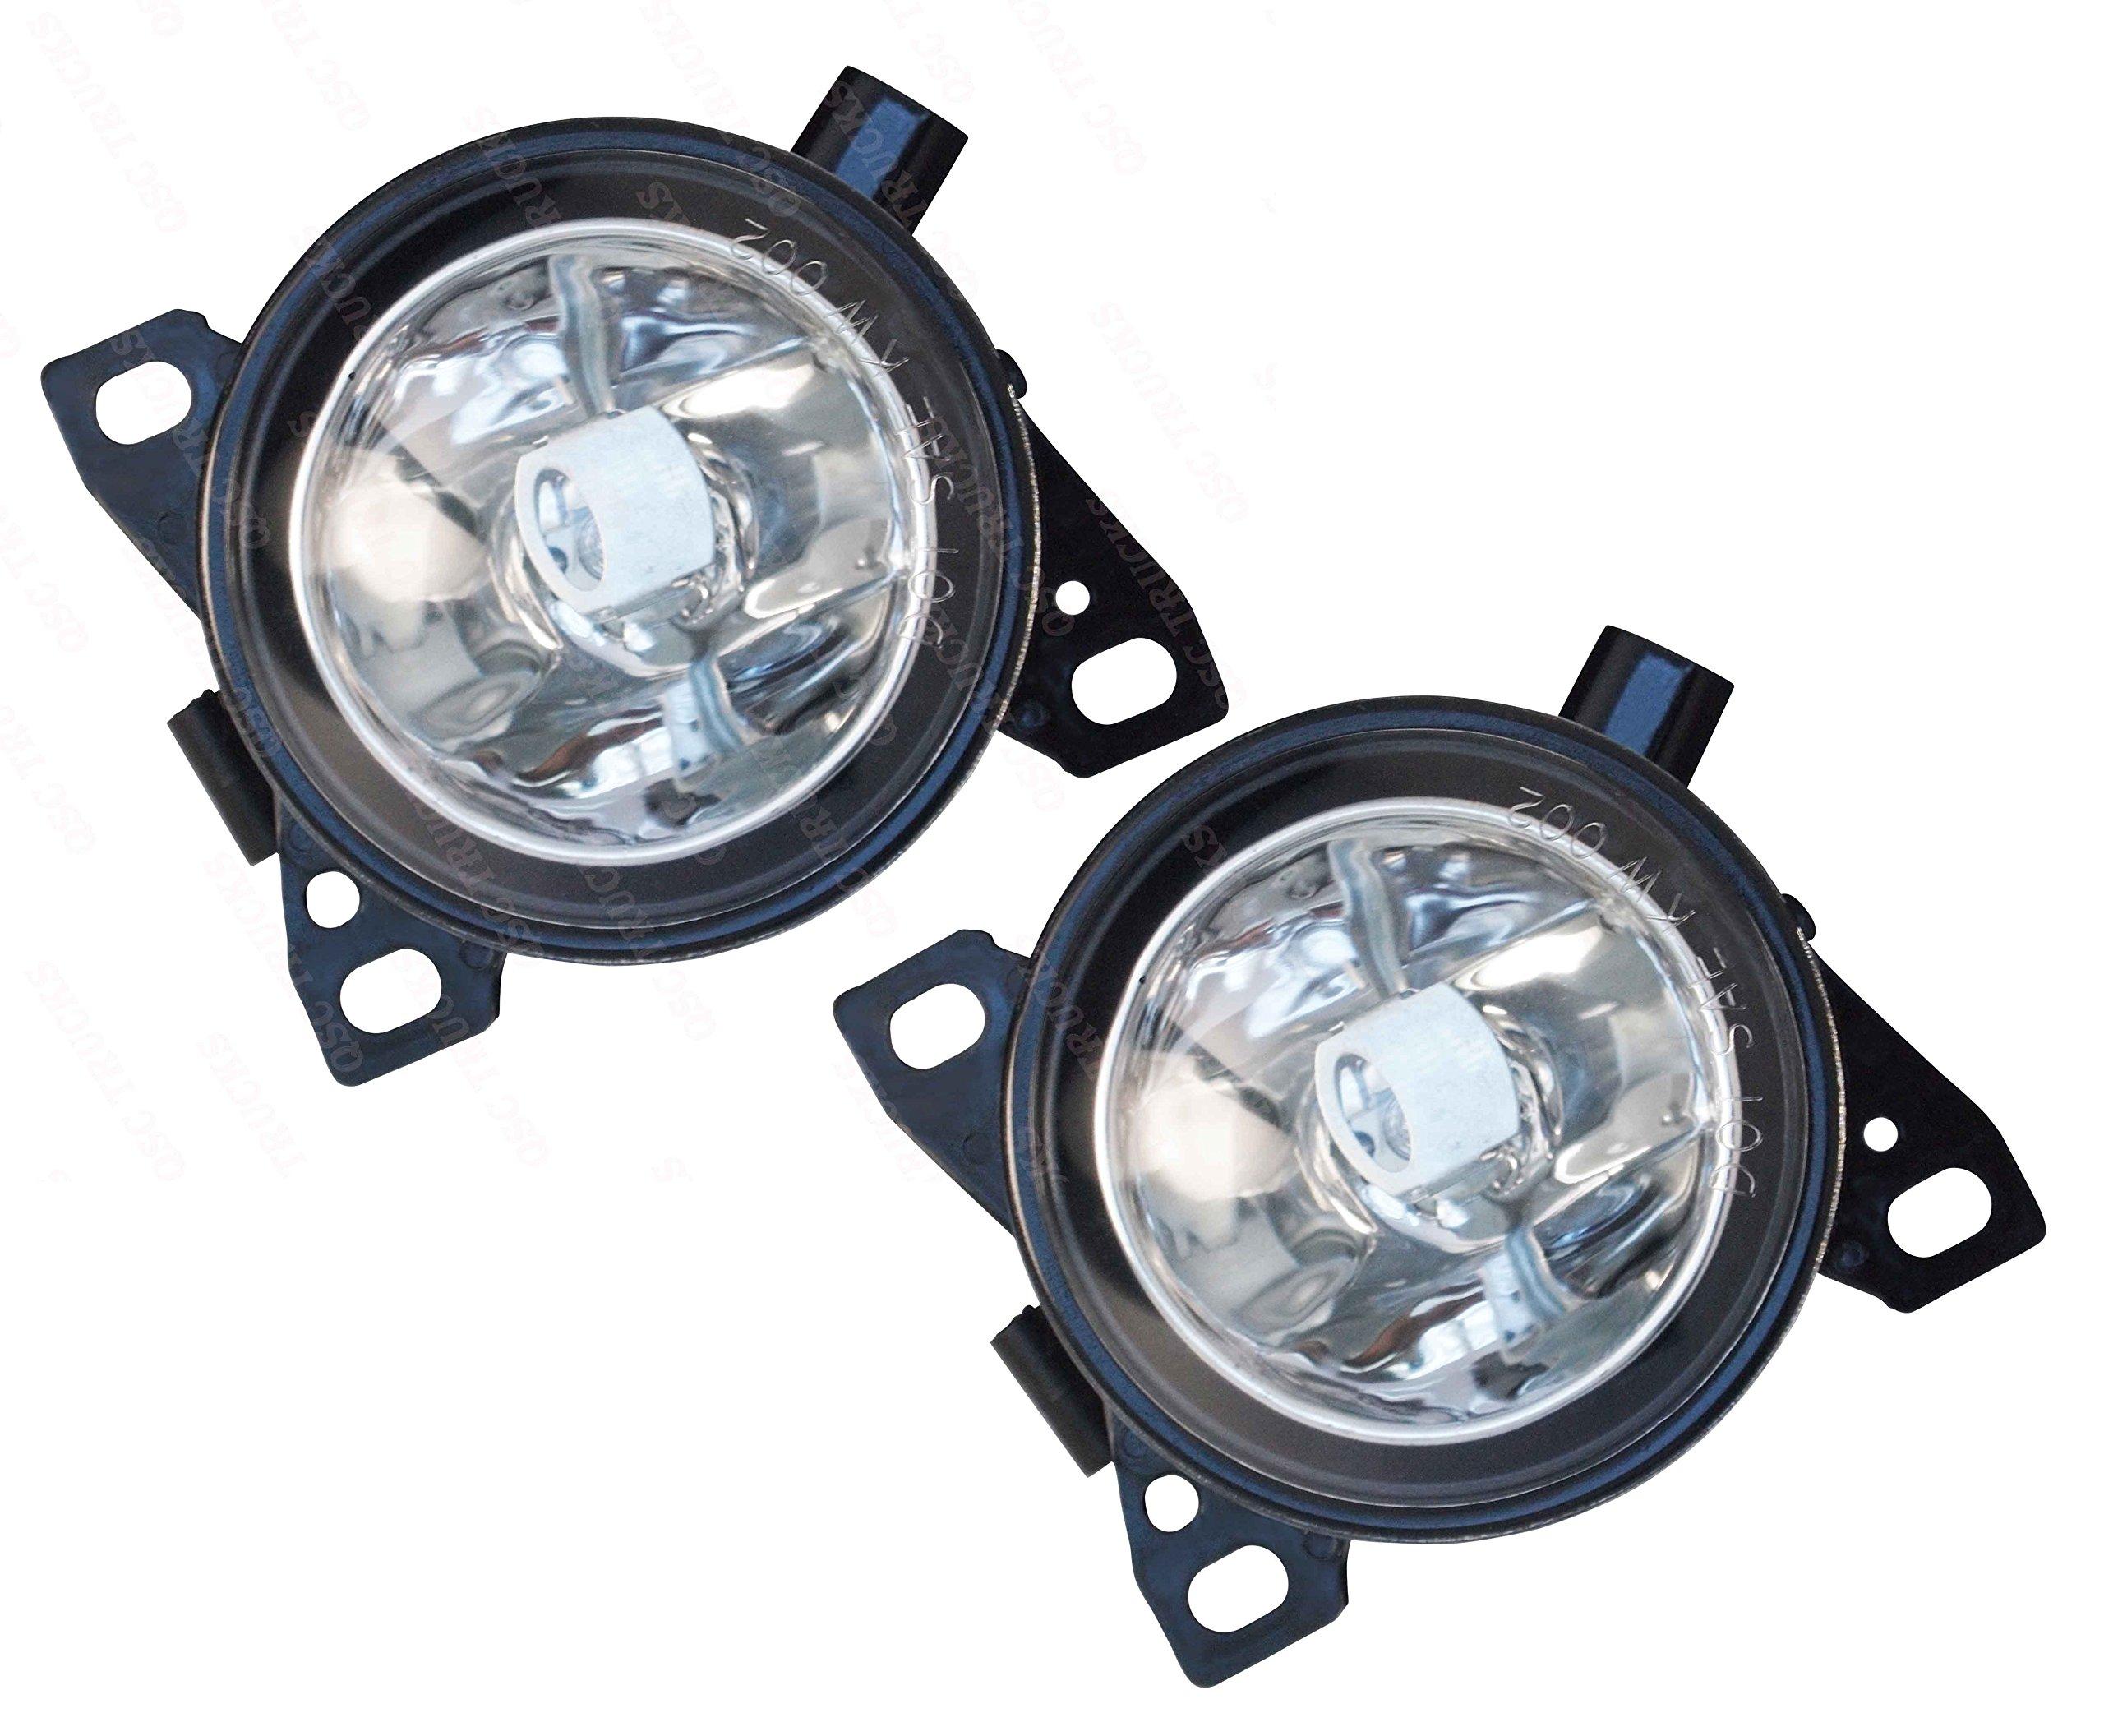 QSC Fog Lights Lamps Pair LH RH w/Bulbs for Kenworth T660 Peterbilt 579 587